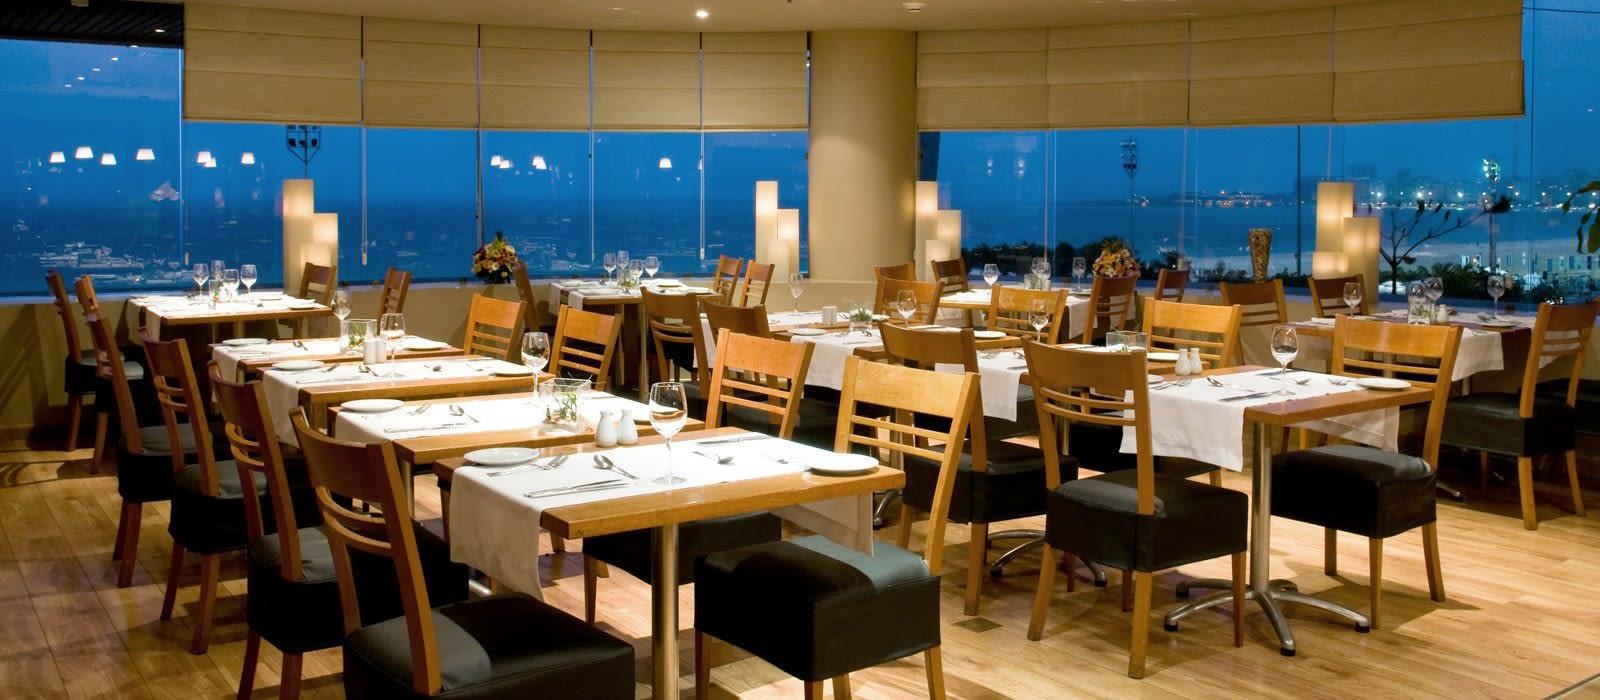 Hotel PortoBay Brazil